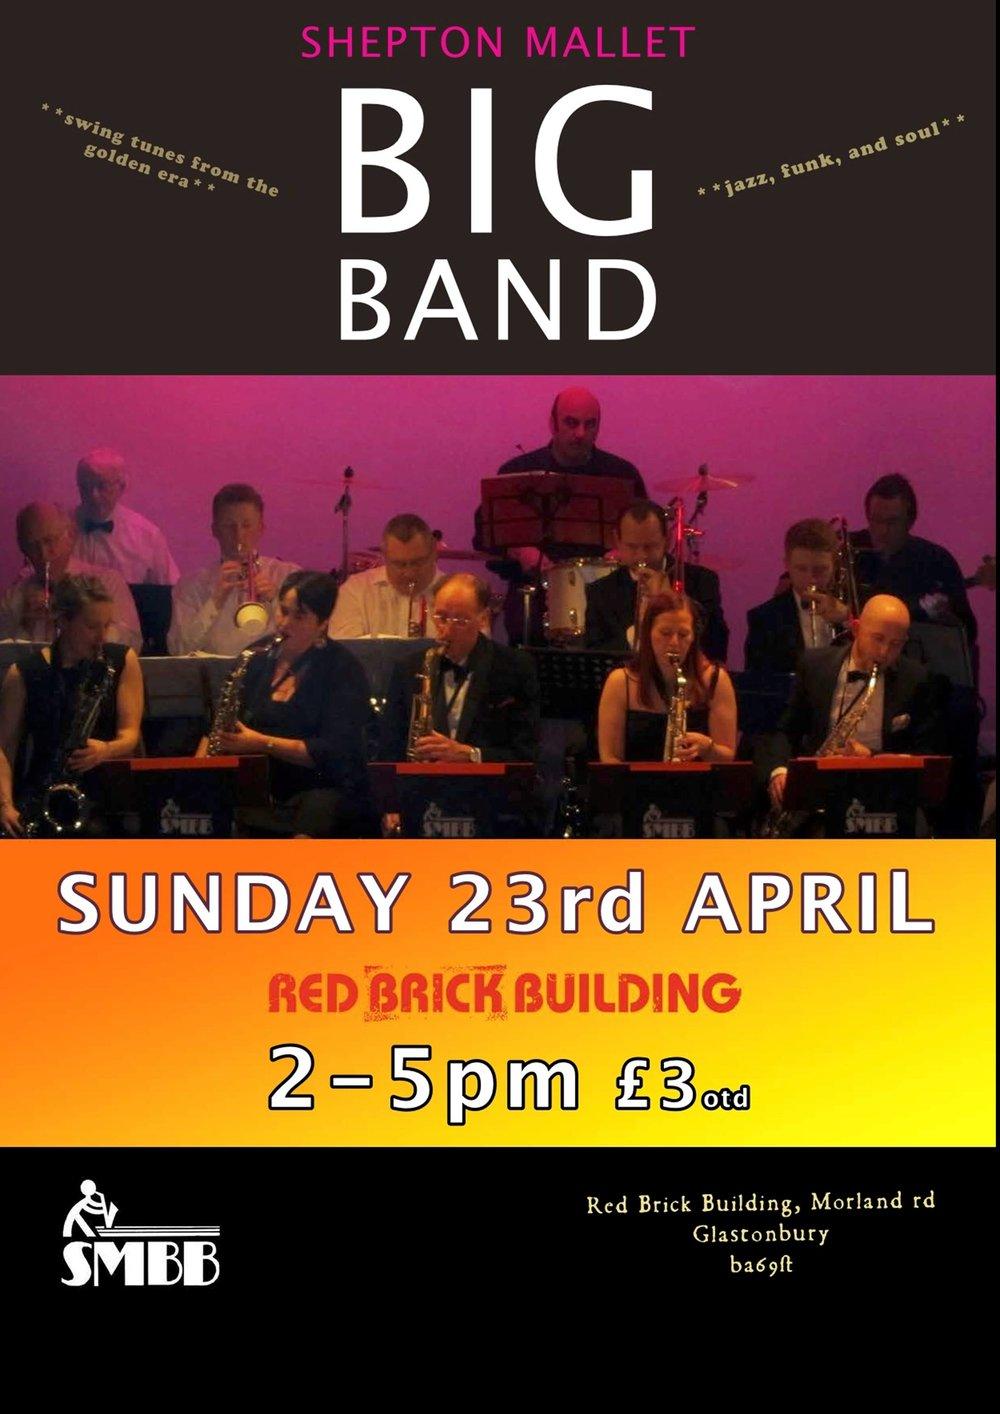 Shepton Mallet Big Band.jpg